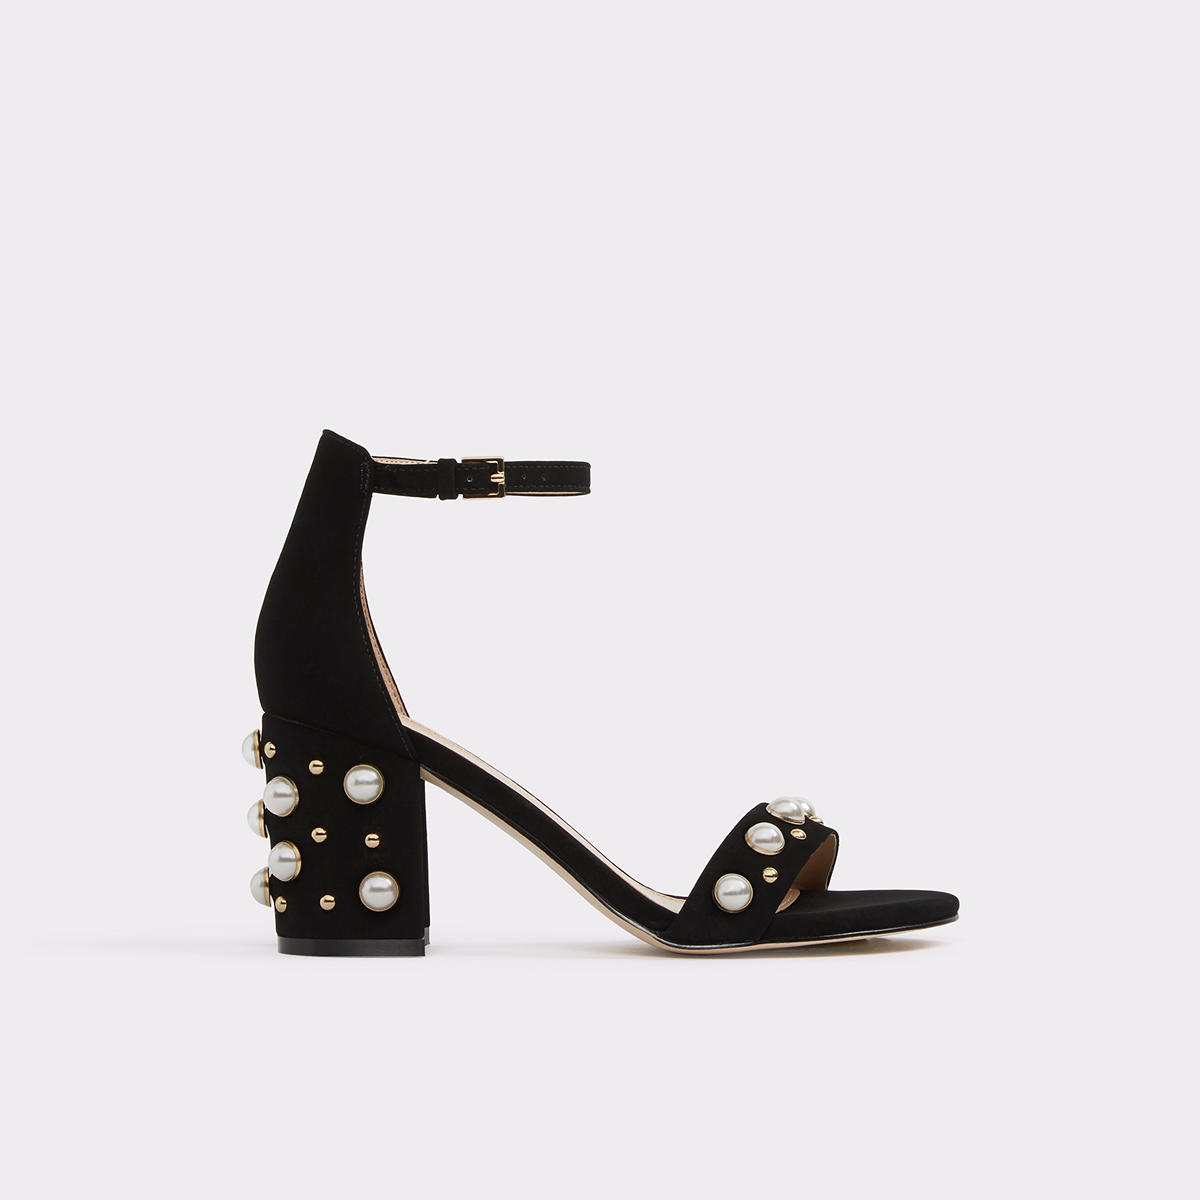 Majorca Black Women's Open-toe heels | ALDO US at Aldo Shoes in Victor, NY | Tuggl